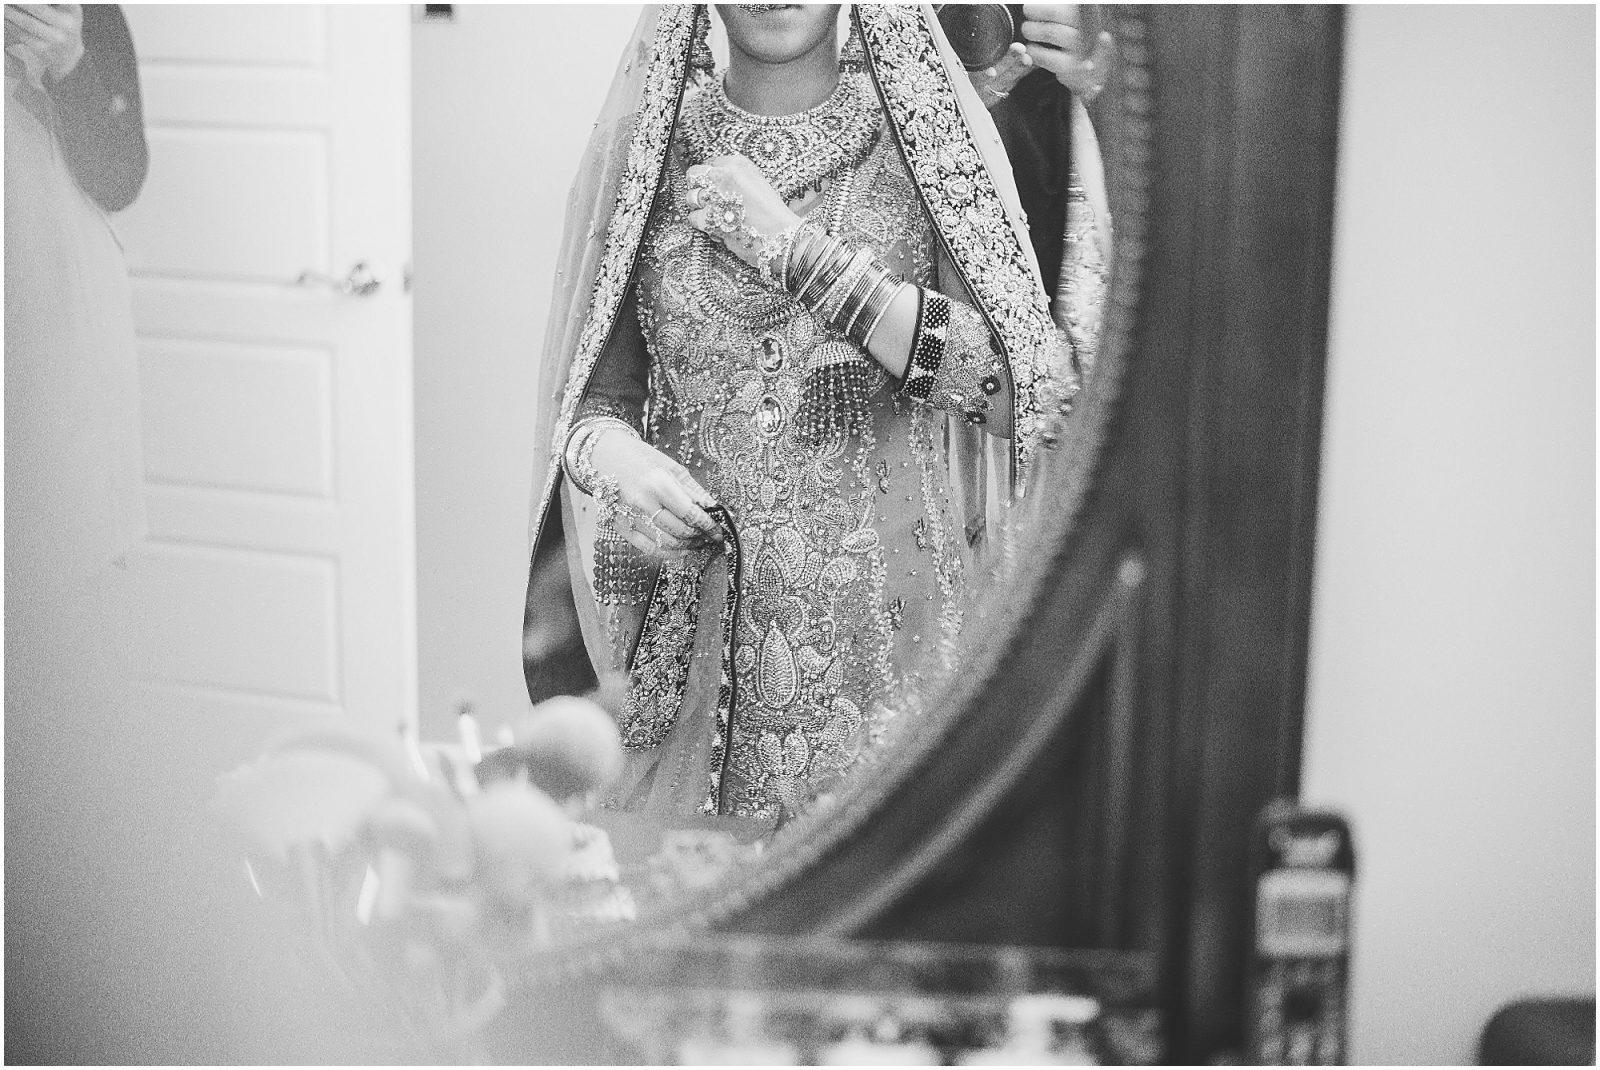 South Asian Wedding Toronto - Mehndi - Nikah, walima, indian wedding, pakistani wedding. Sarah & Sajid - bridal details, bride getting ready , black and white